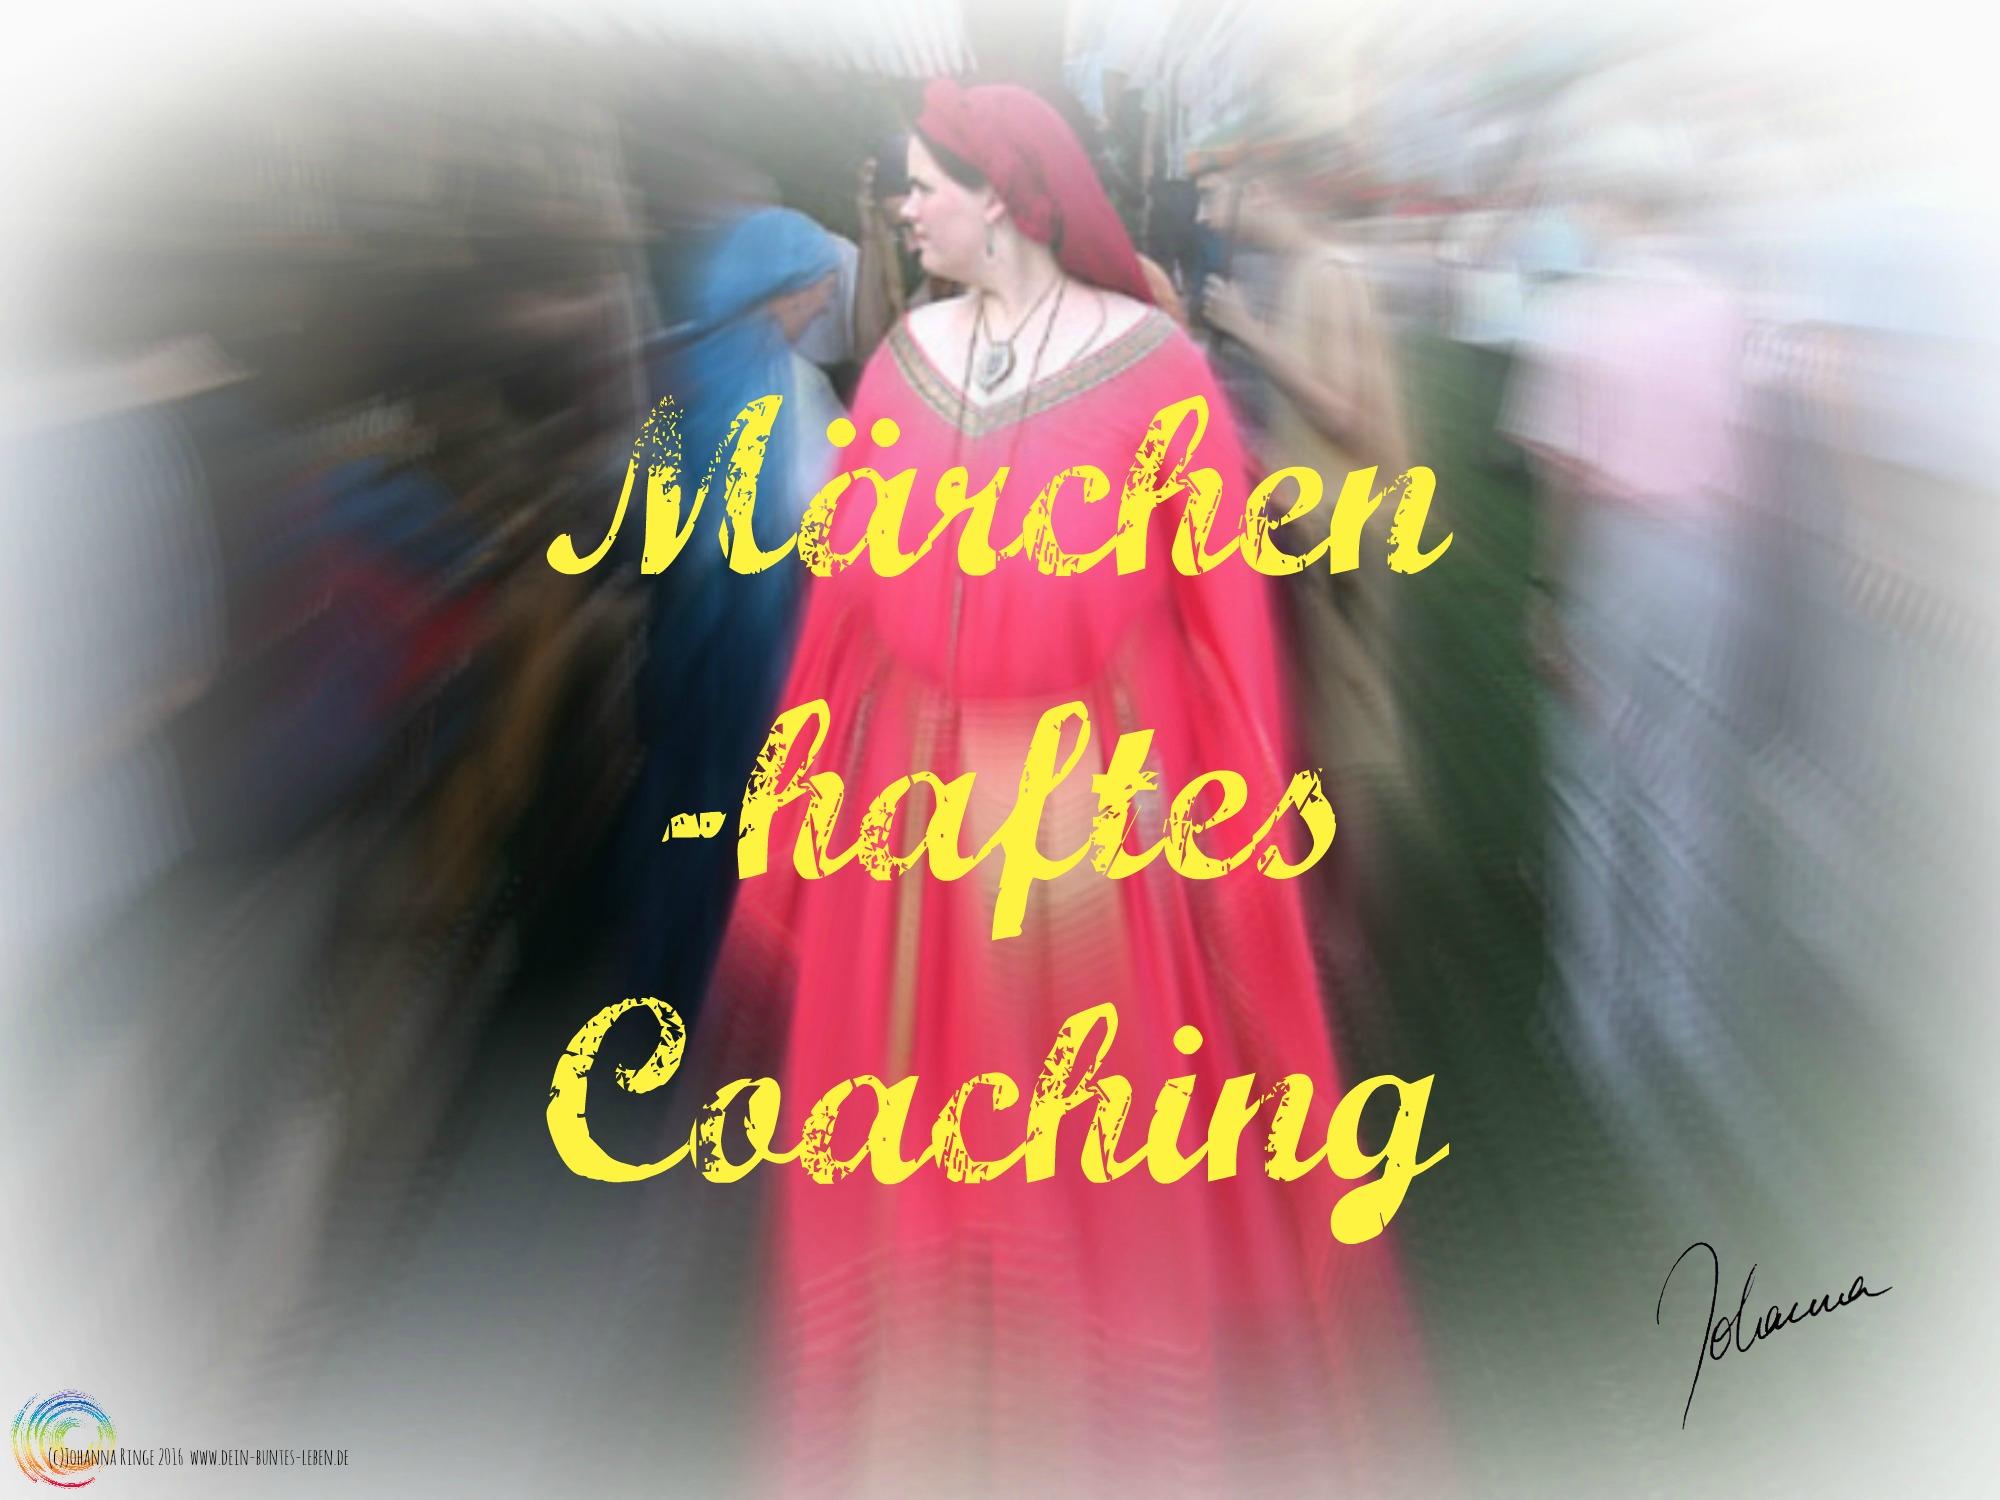 Märchen -haftes Coaching (c)Johanna Ringe www.dein-buntes-leben.de www.johanna-ringe.coach